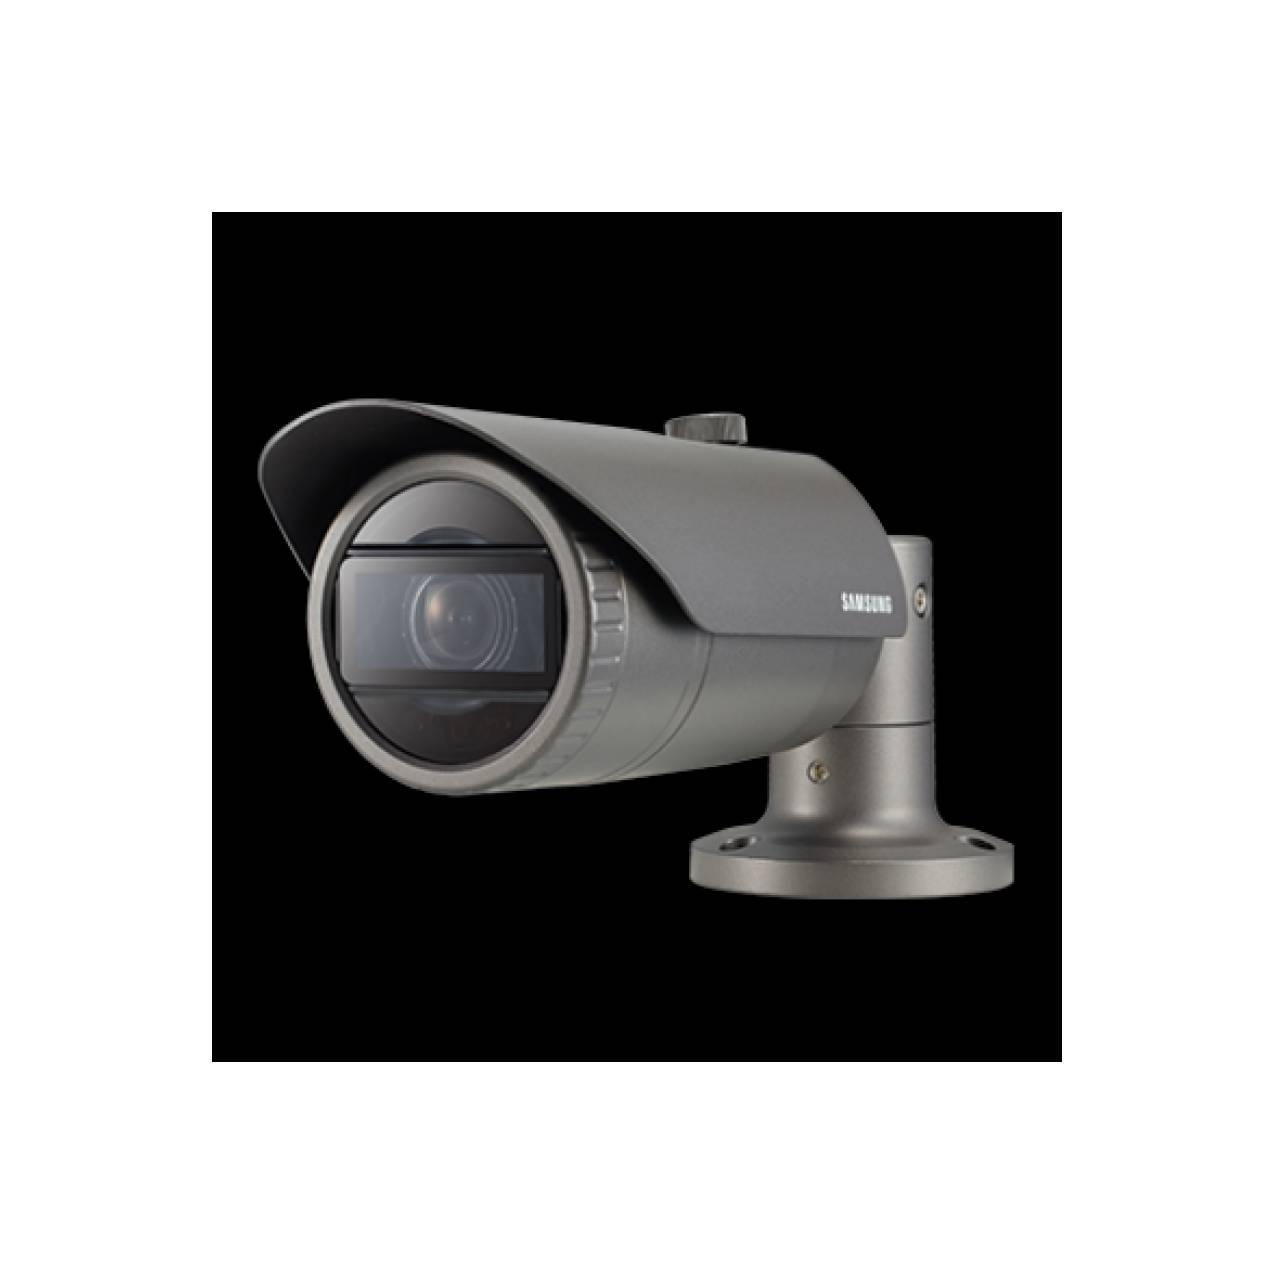 KAMERA CAMERA CCTV SAMSUNG DOME QNO-6070R QNO-6070RP IP CAM 2MP RESMI